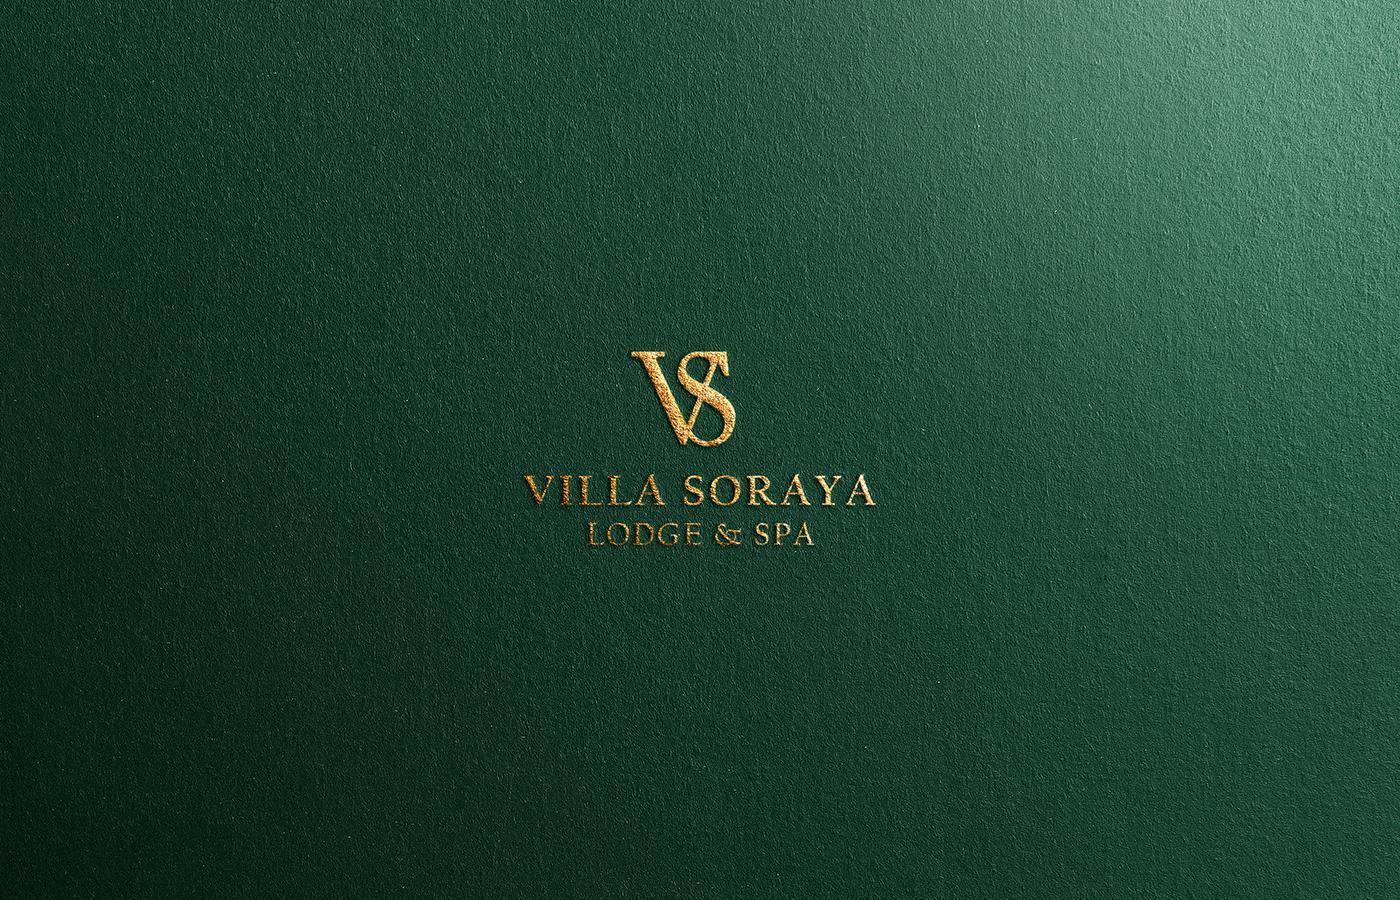 Villa Soraya Brand Identity Designed by Anas Belekhbizi